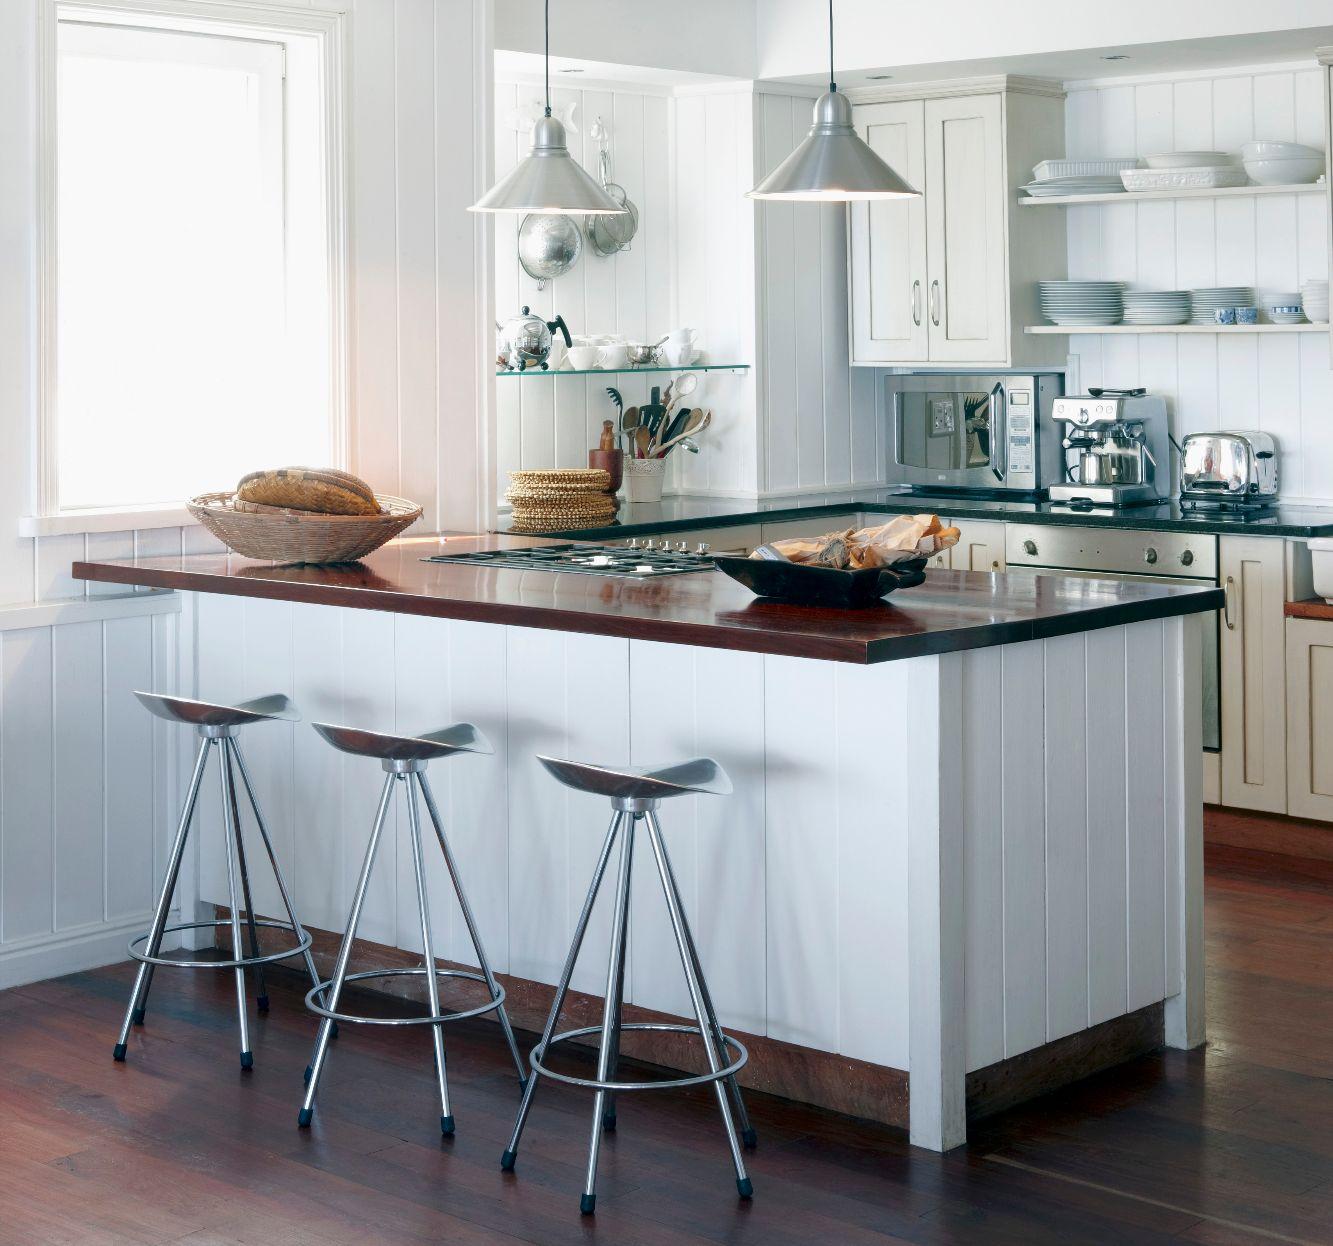 Барный стол на кухне